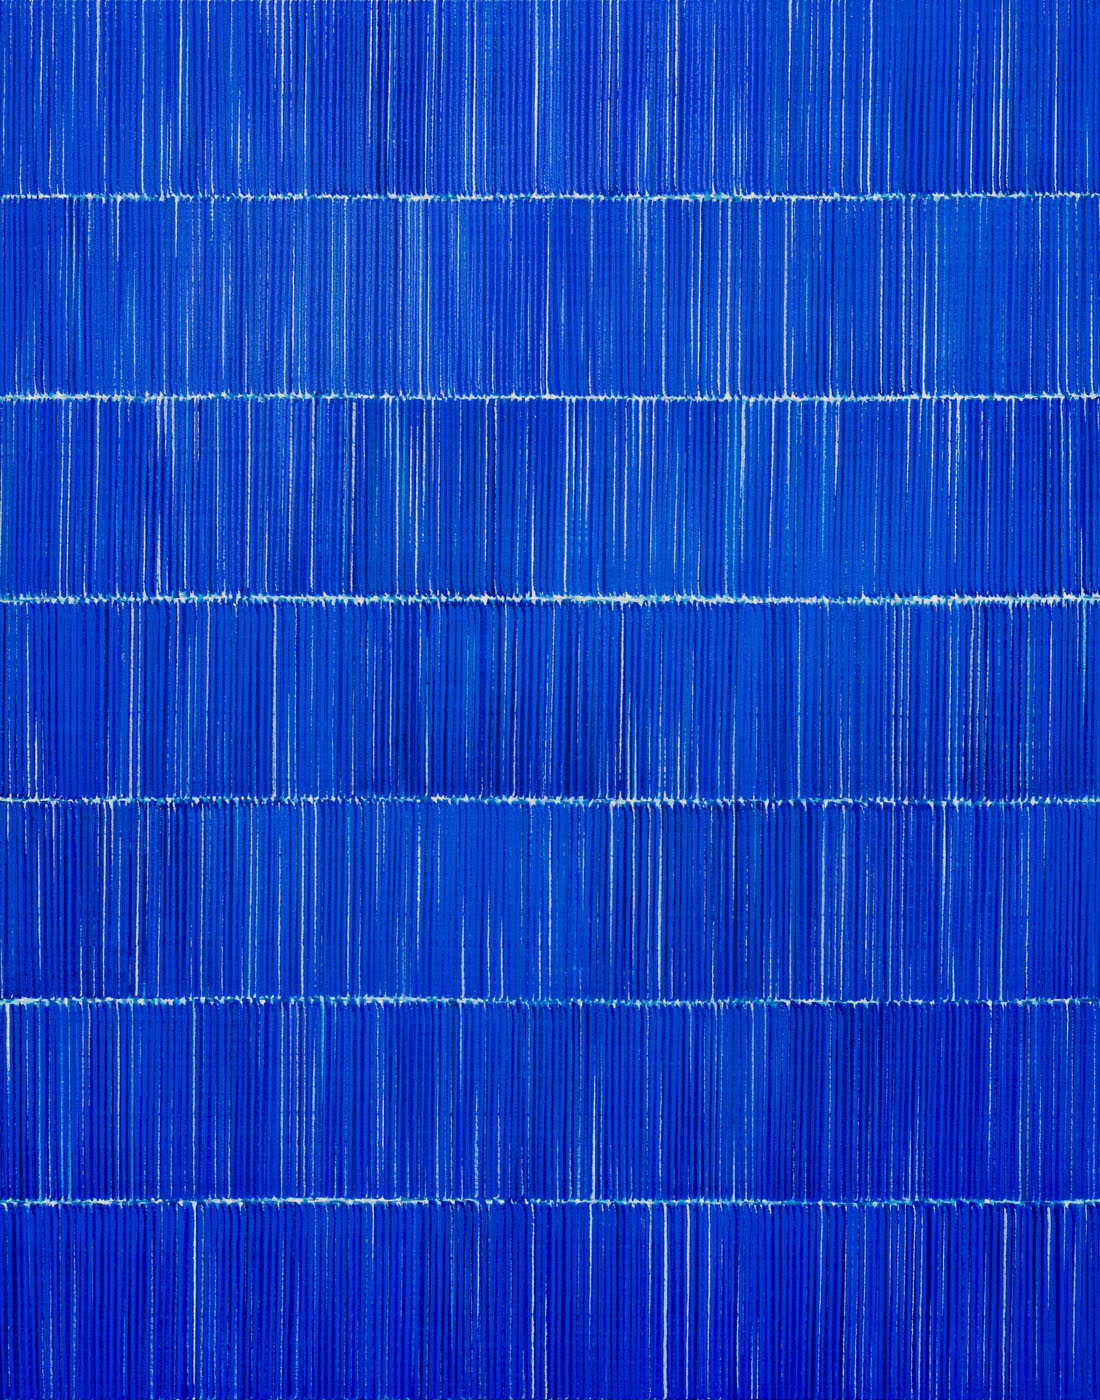 Nikola Dimitrov, FarbKlangBlau I 2019, Pigmente, Bindemittel auf Leinwand, 140 ×110 cm